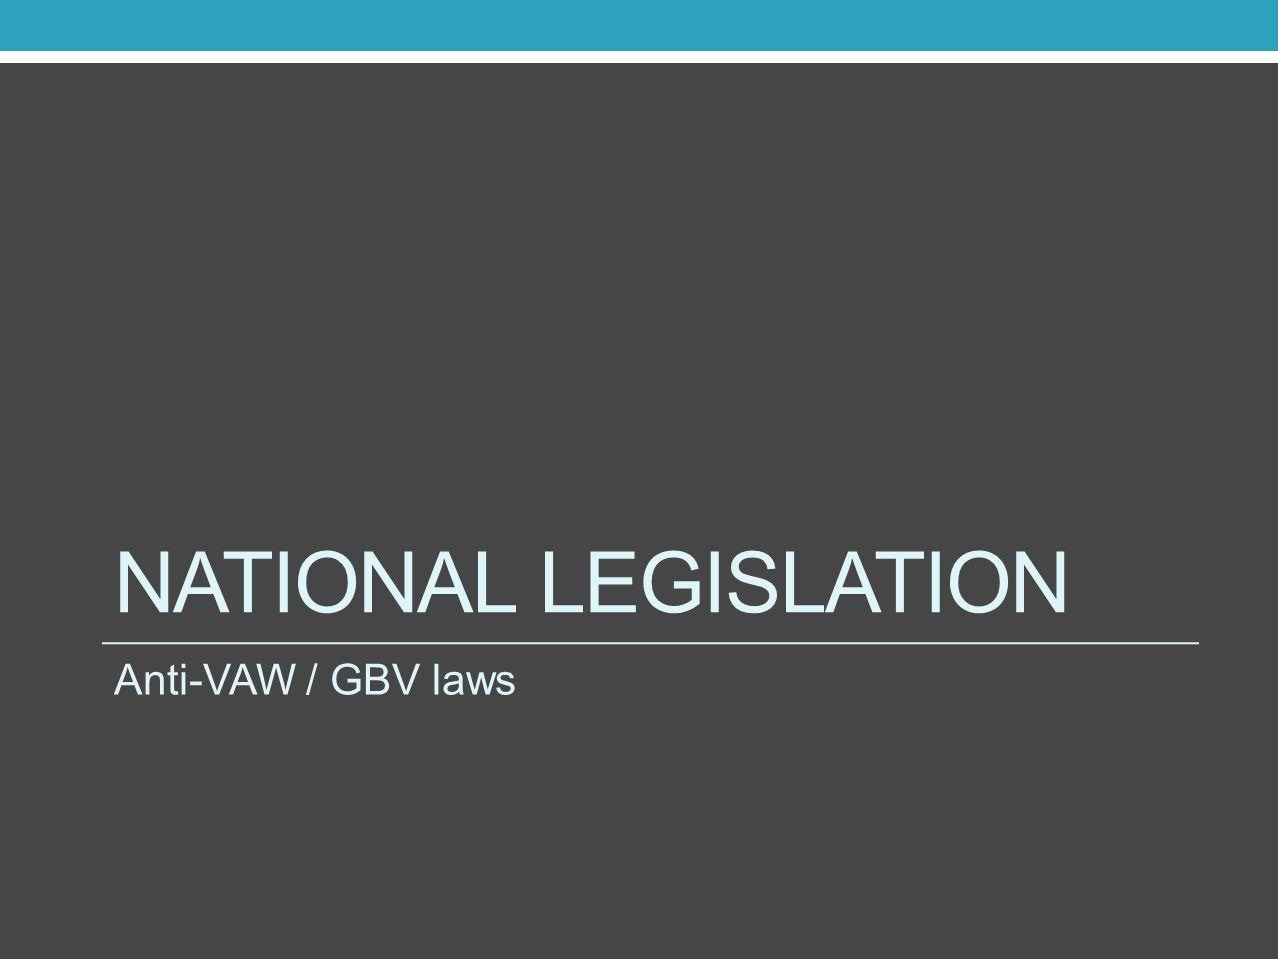 NATIONAL LEGISLATION Anti-VAW / GBV laws